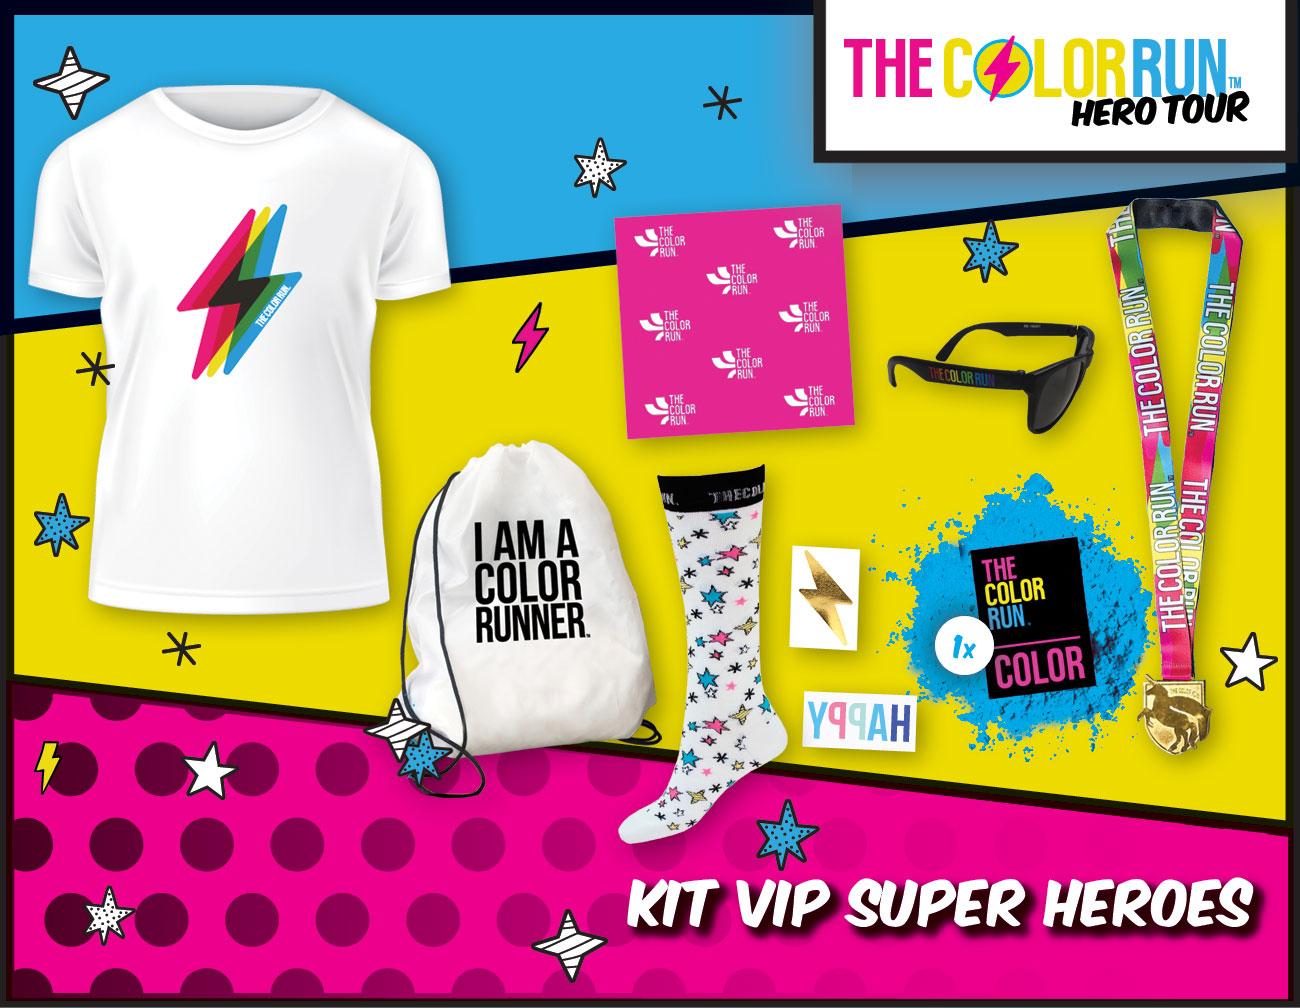 Vip Super Heroes Participant Kit